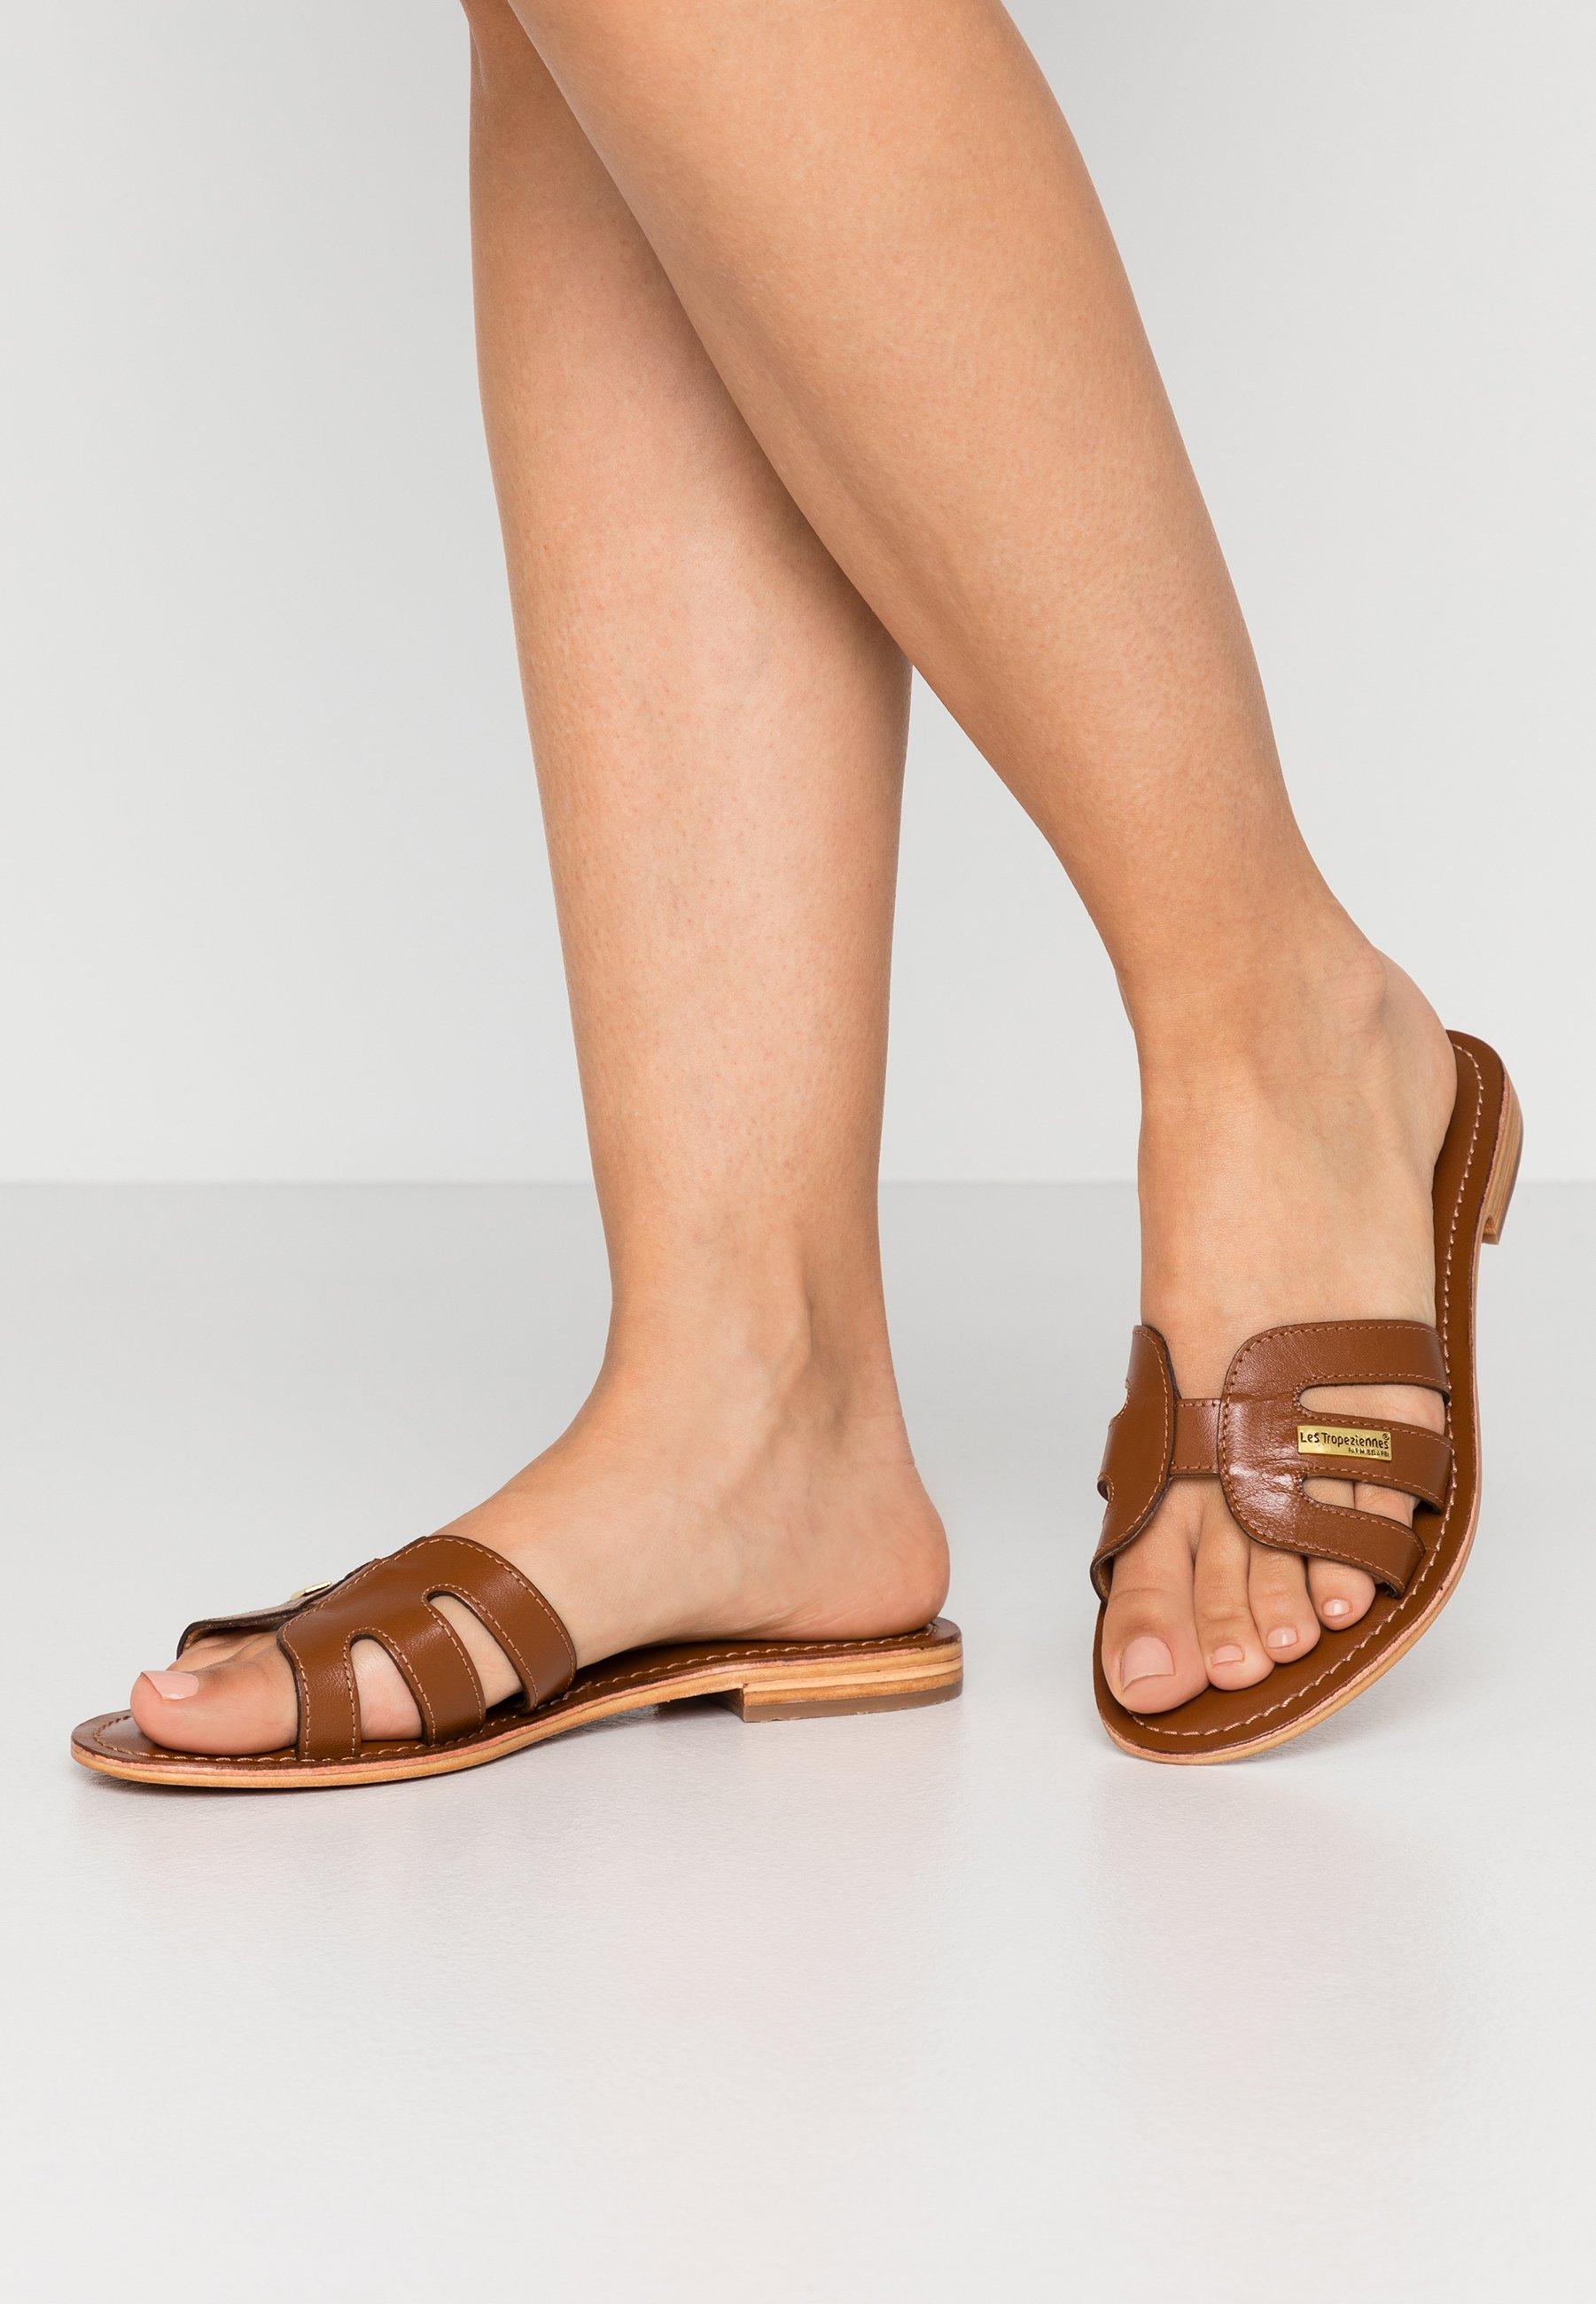 Damen DAMIA - Pantolette flach